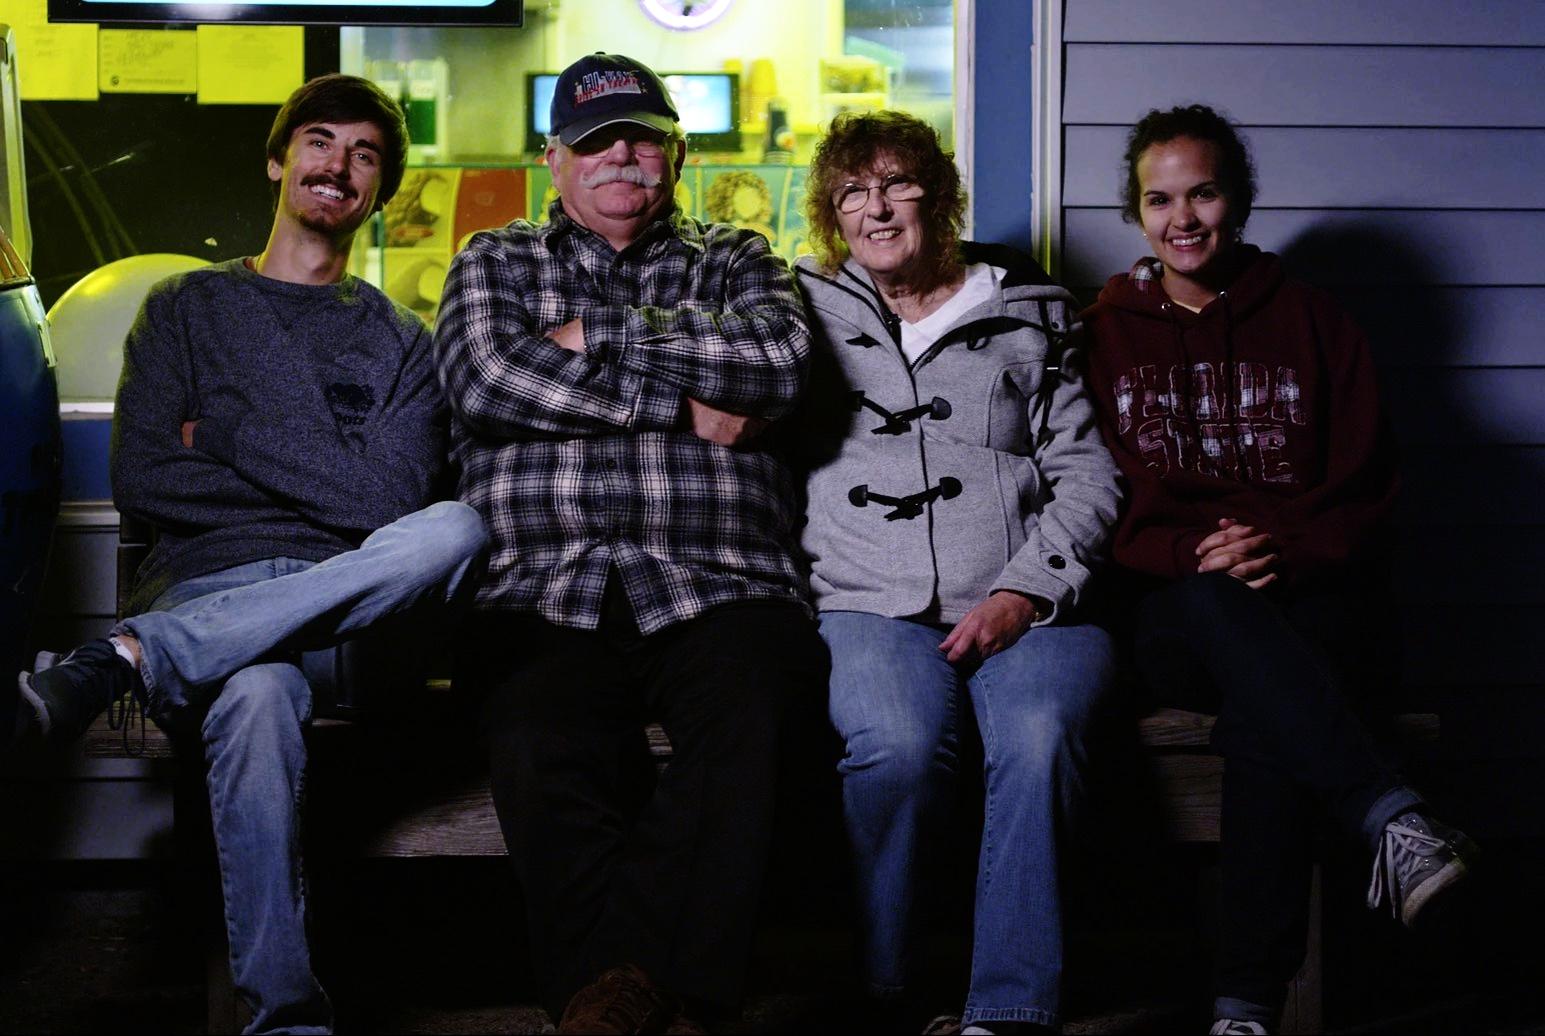 Adam Carboni (filmmaker, far-right),Roger Babcock (Hi-Way's co-owner), Sharon Babcock (Hi-Way's co-owner), &Tansy Michaud (filmmaker, far-left)